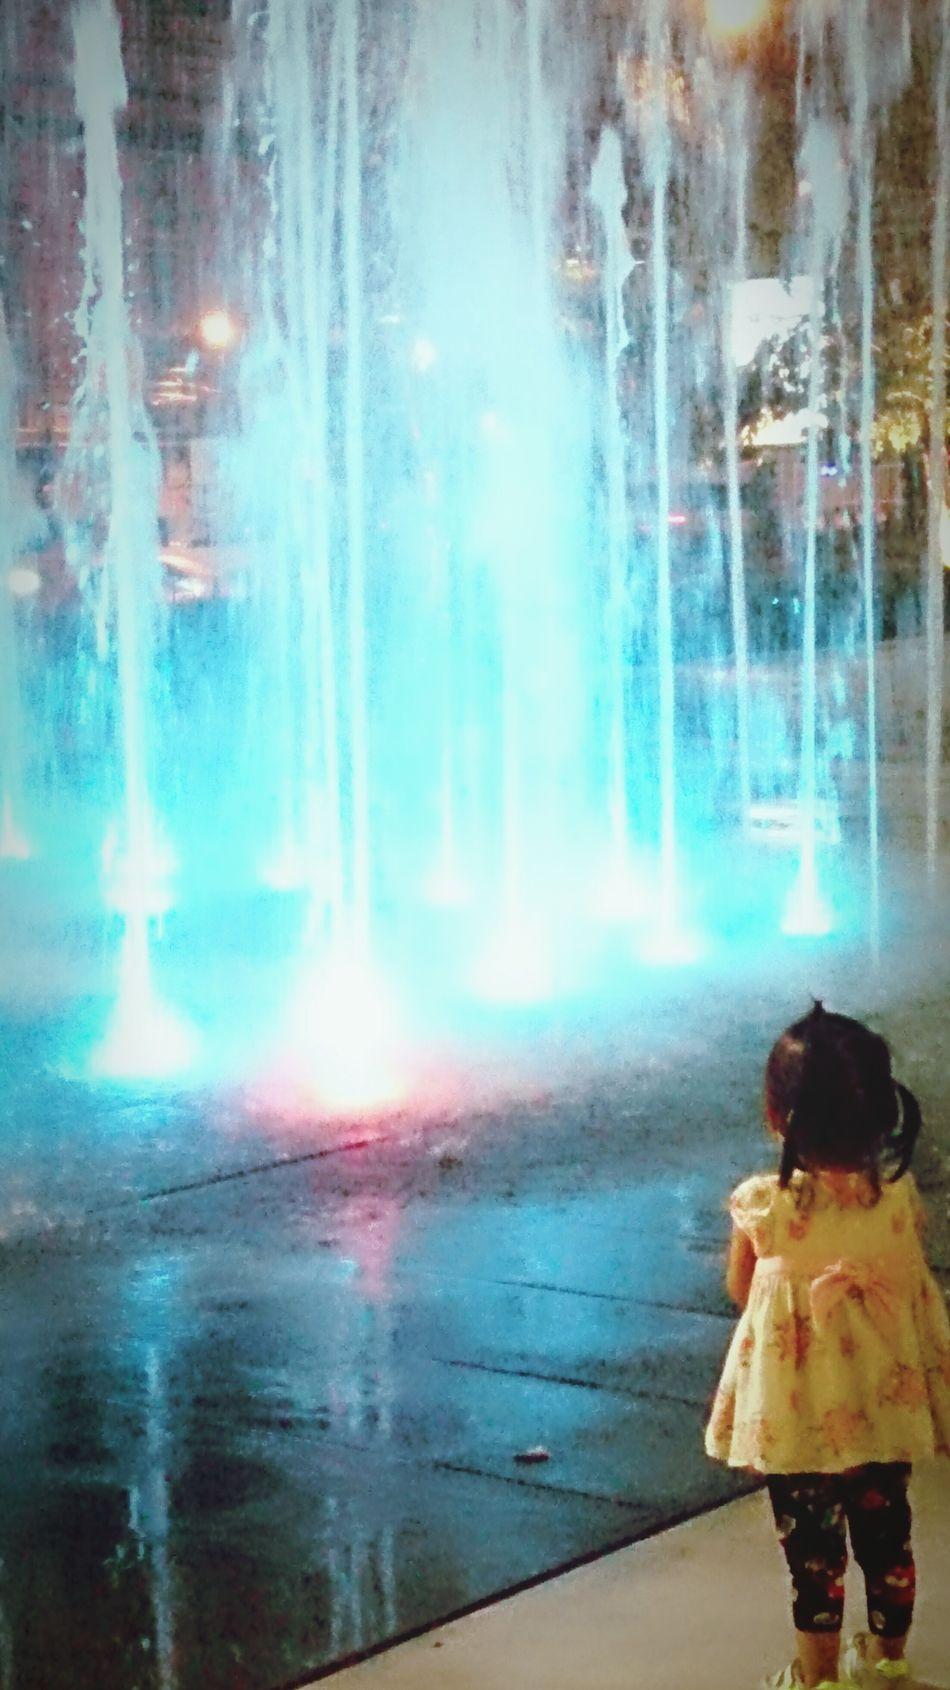 Girl Standing Fountain Colorful Relaxing Worderful Enjoying Life Bangkok Thailand. Life Family Cutekids Streetphotography Traveling Sidewalk